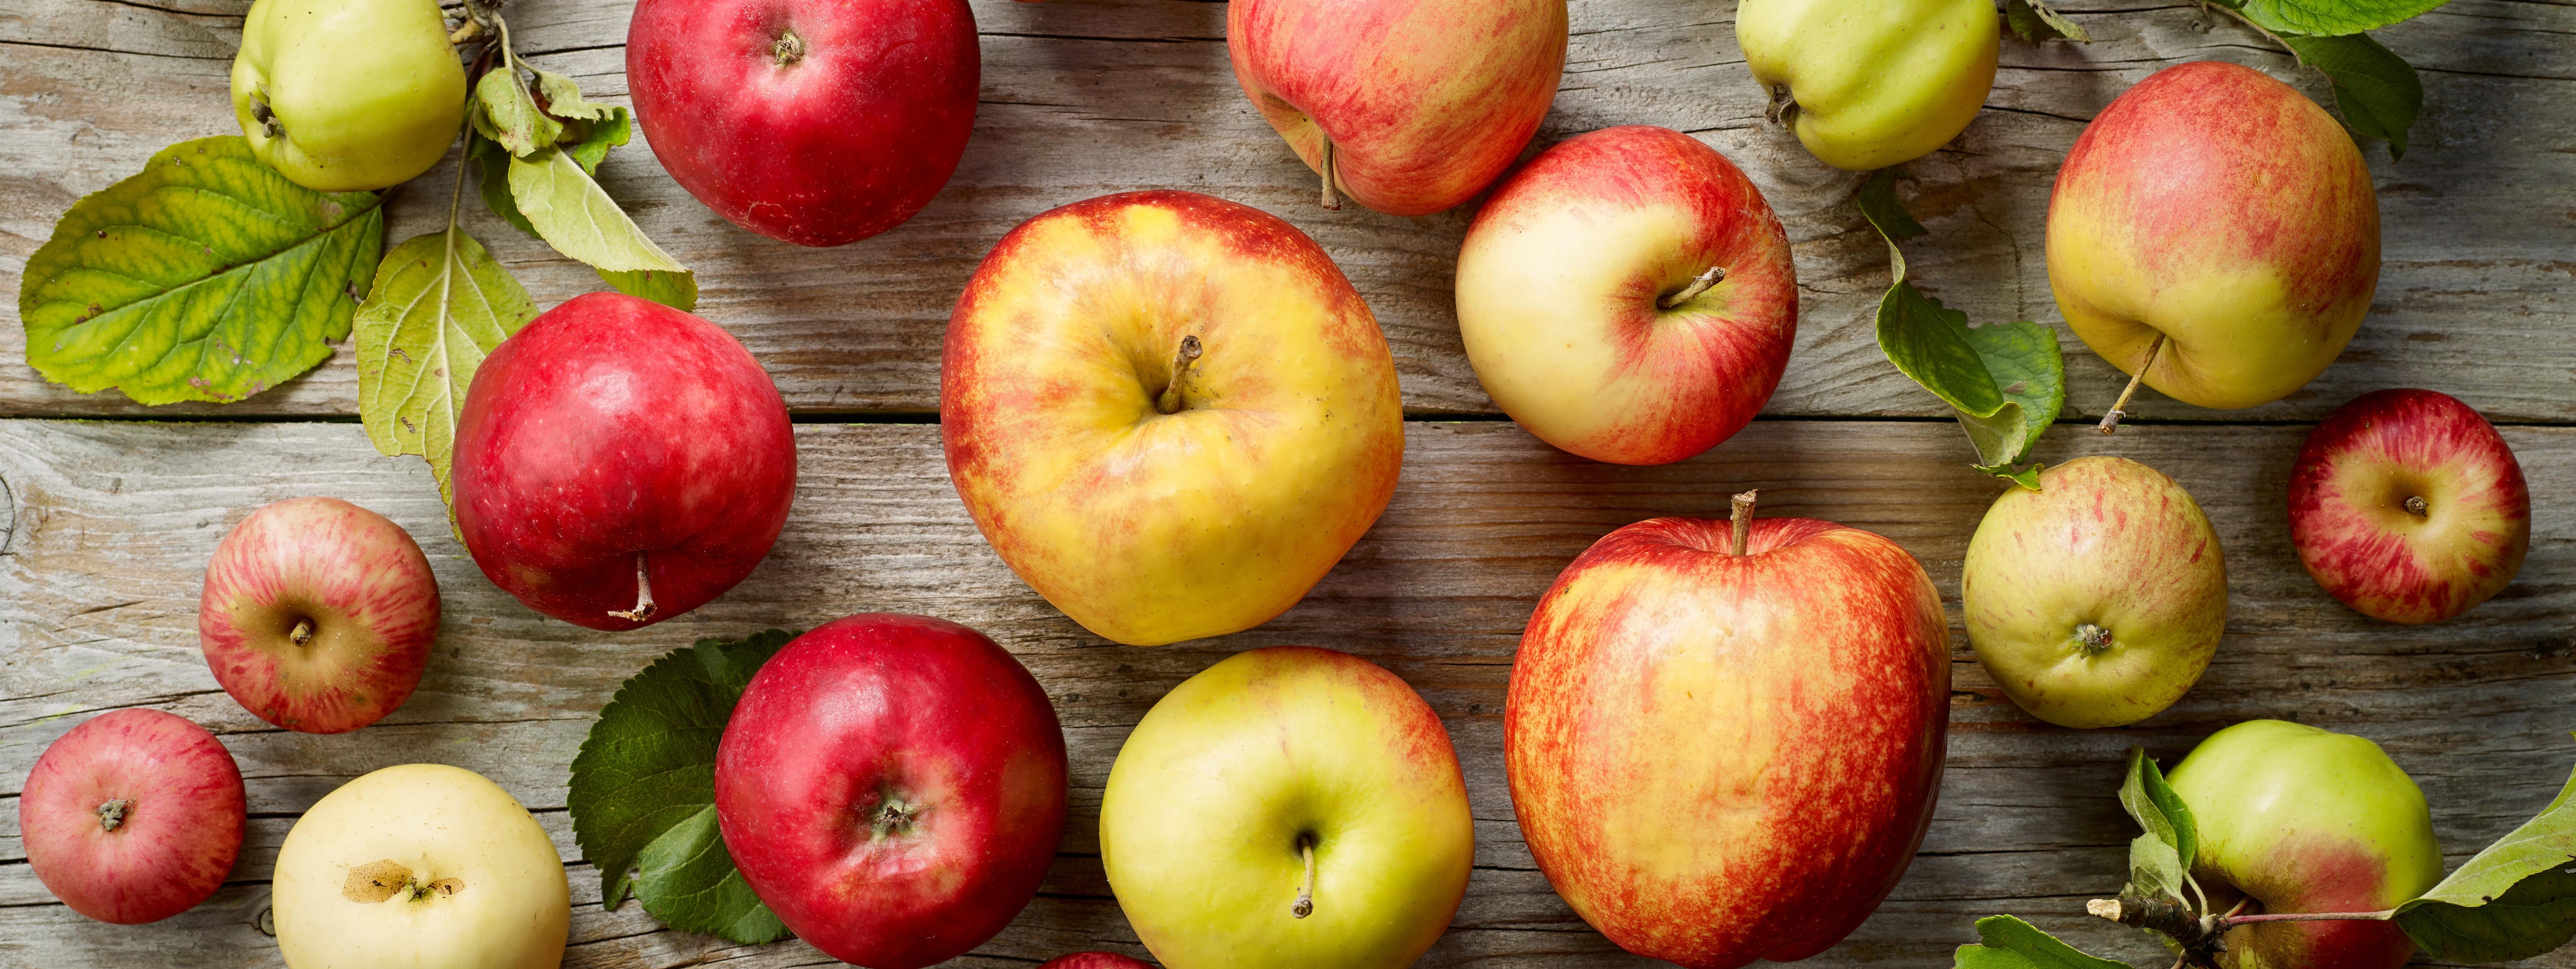 Apple Variety